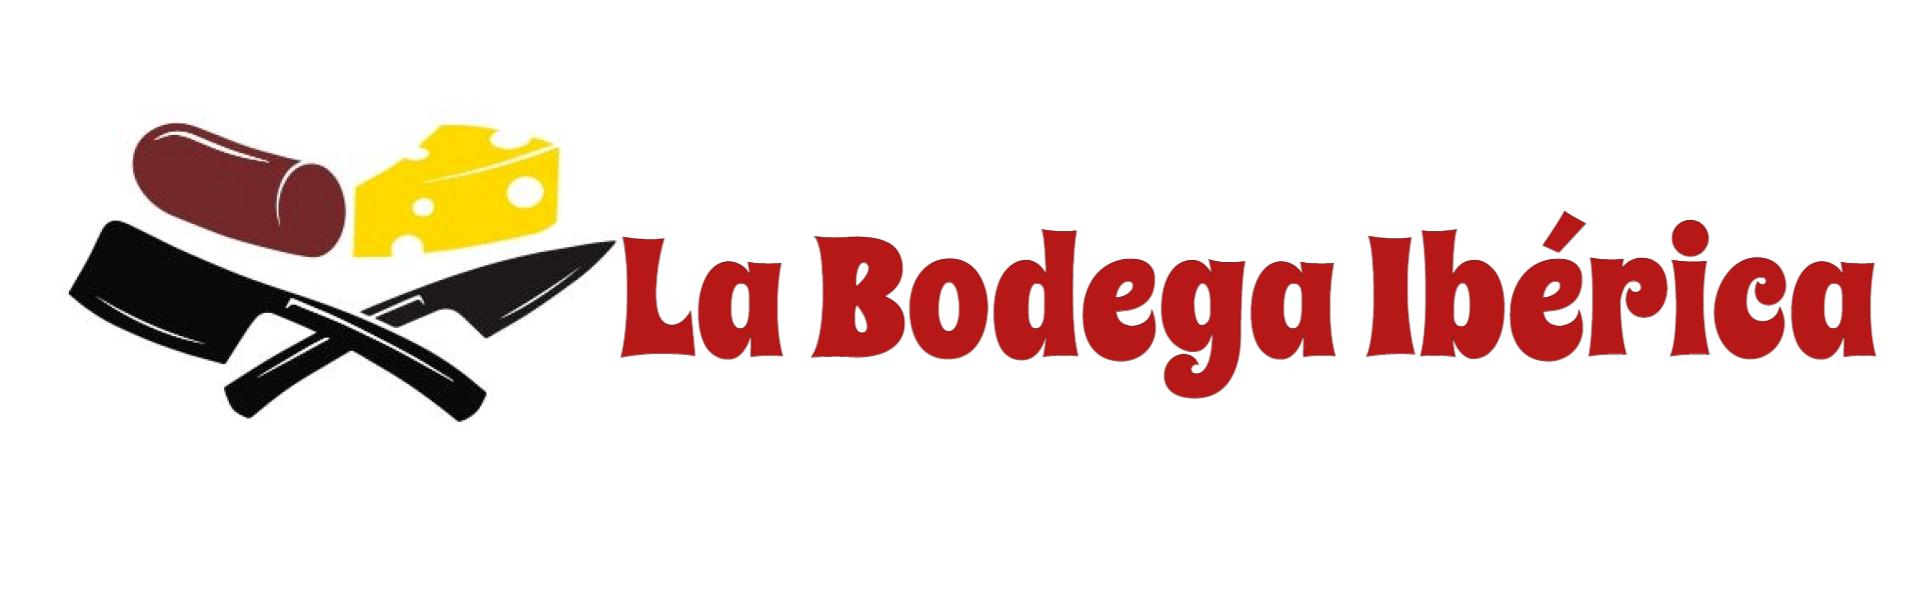 La Bodega Ibérica Original